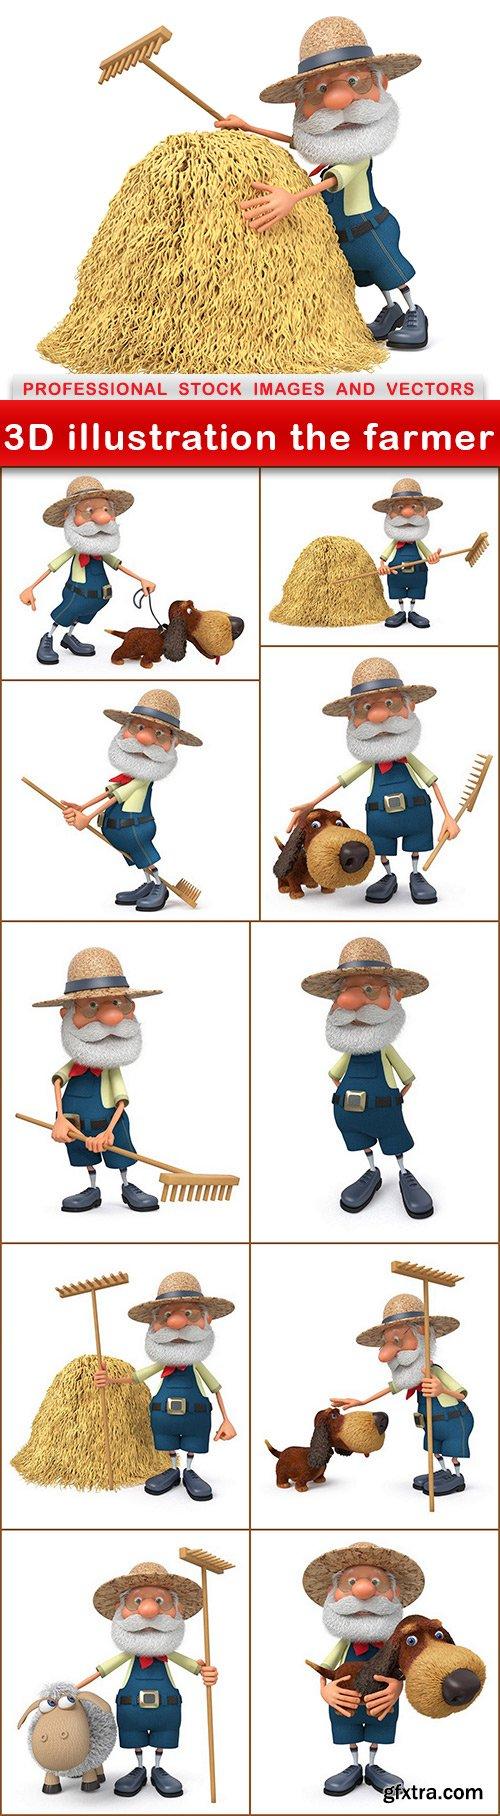 3D illustration the farmer - 11 UHQ JPEG